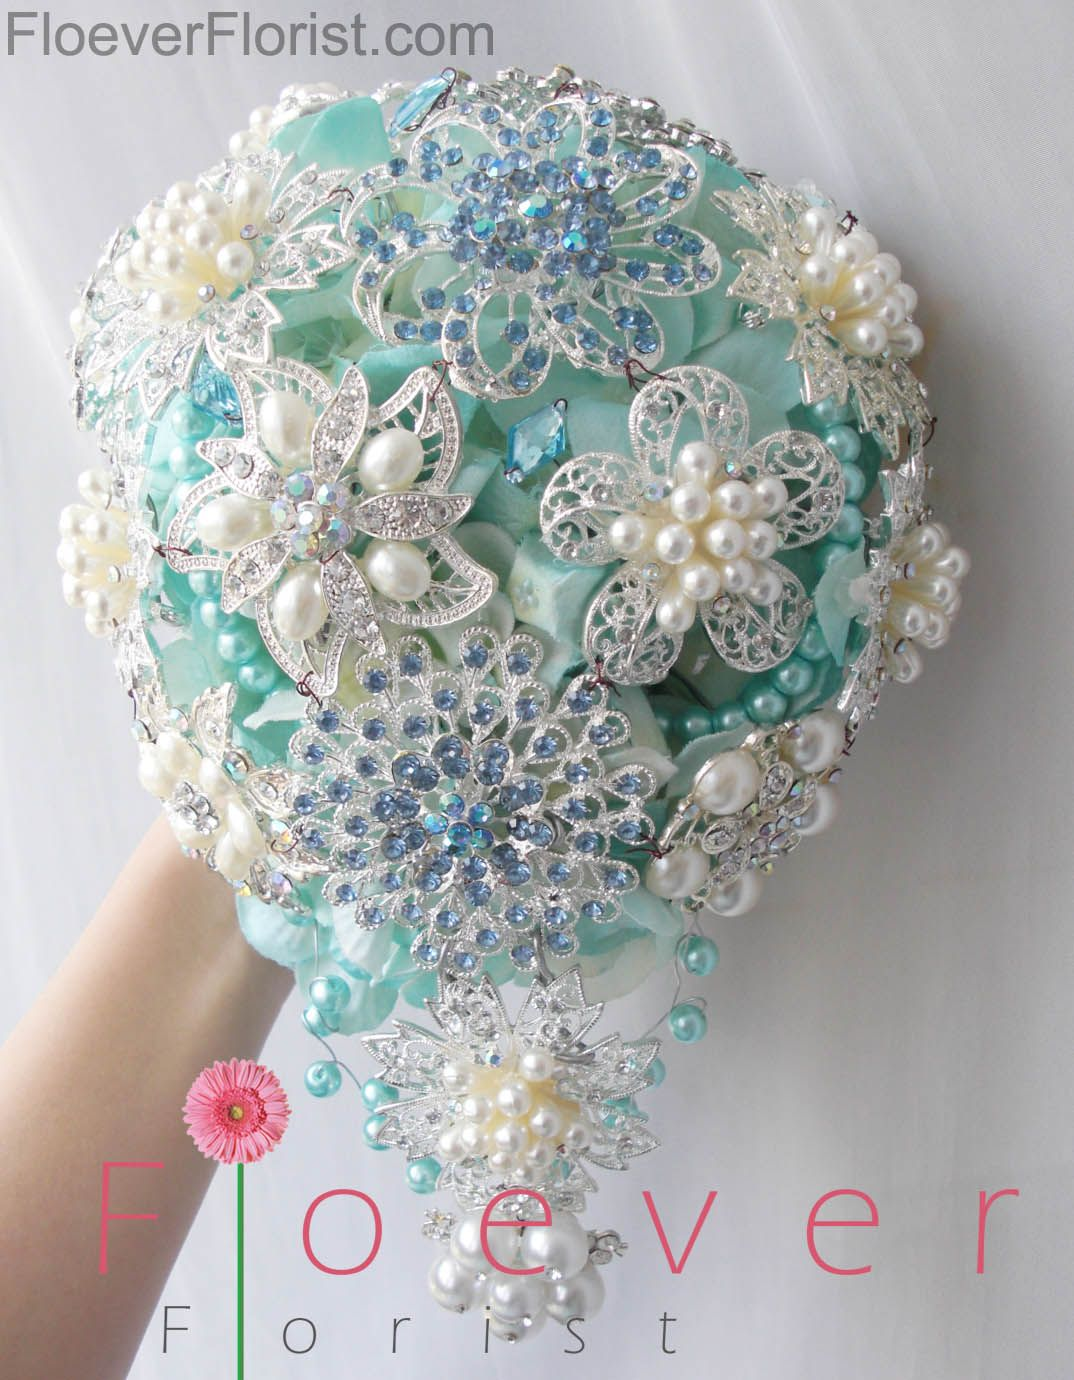 Tiffany Blue Jewel Bouquet | Jewel Bouquet | Pinterest | Tiffany ...